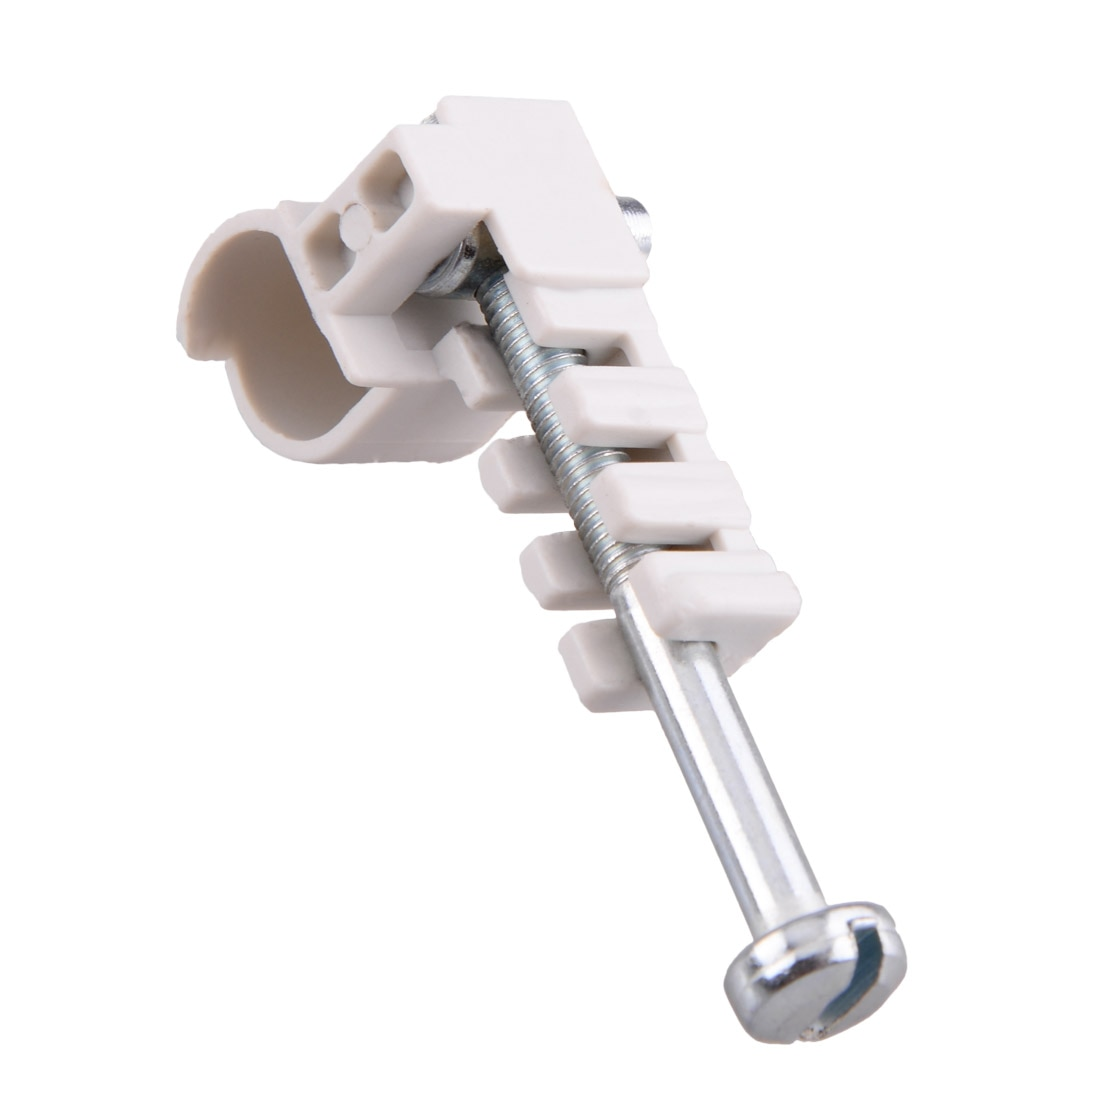 Montaje de tensor de tornillo de ajuste de cadena LETAOSK para Stihl 017 018 MS170 MS180 motosierra 11236641605